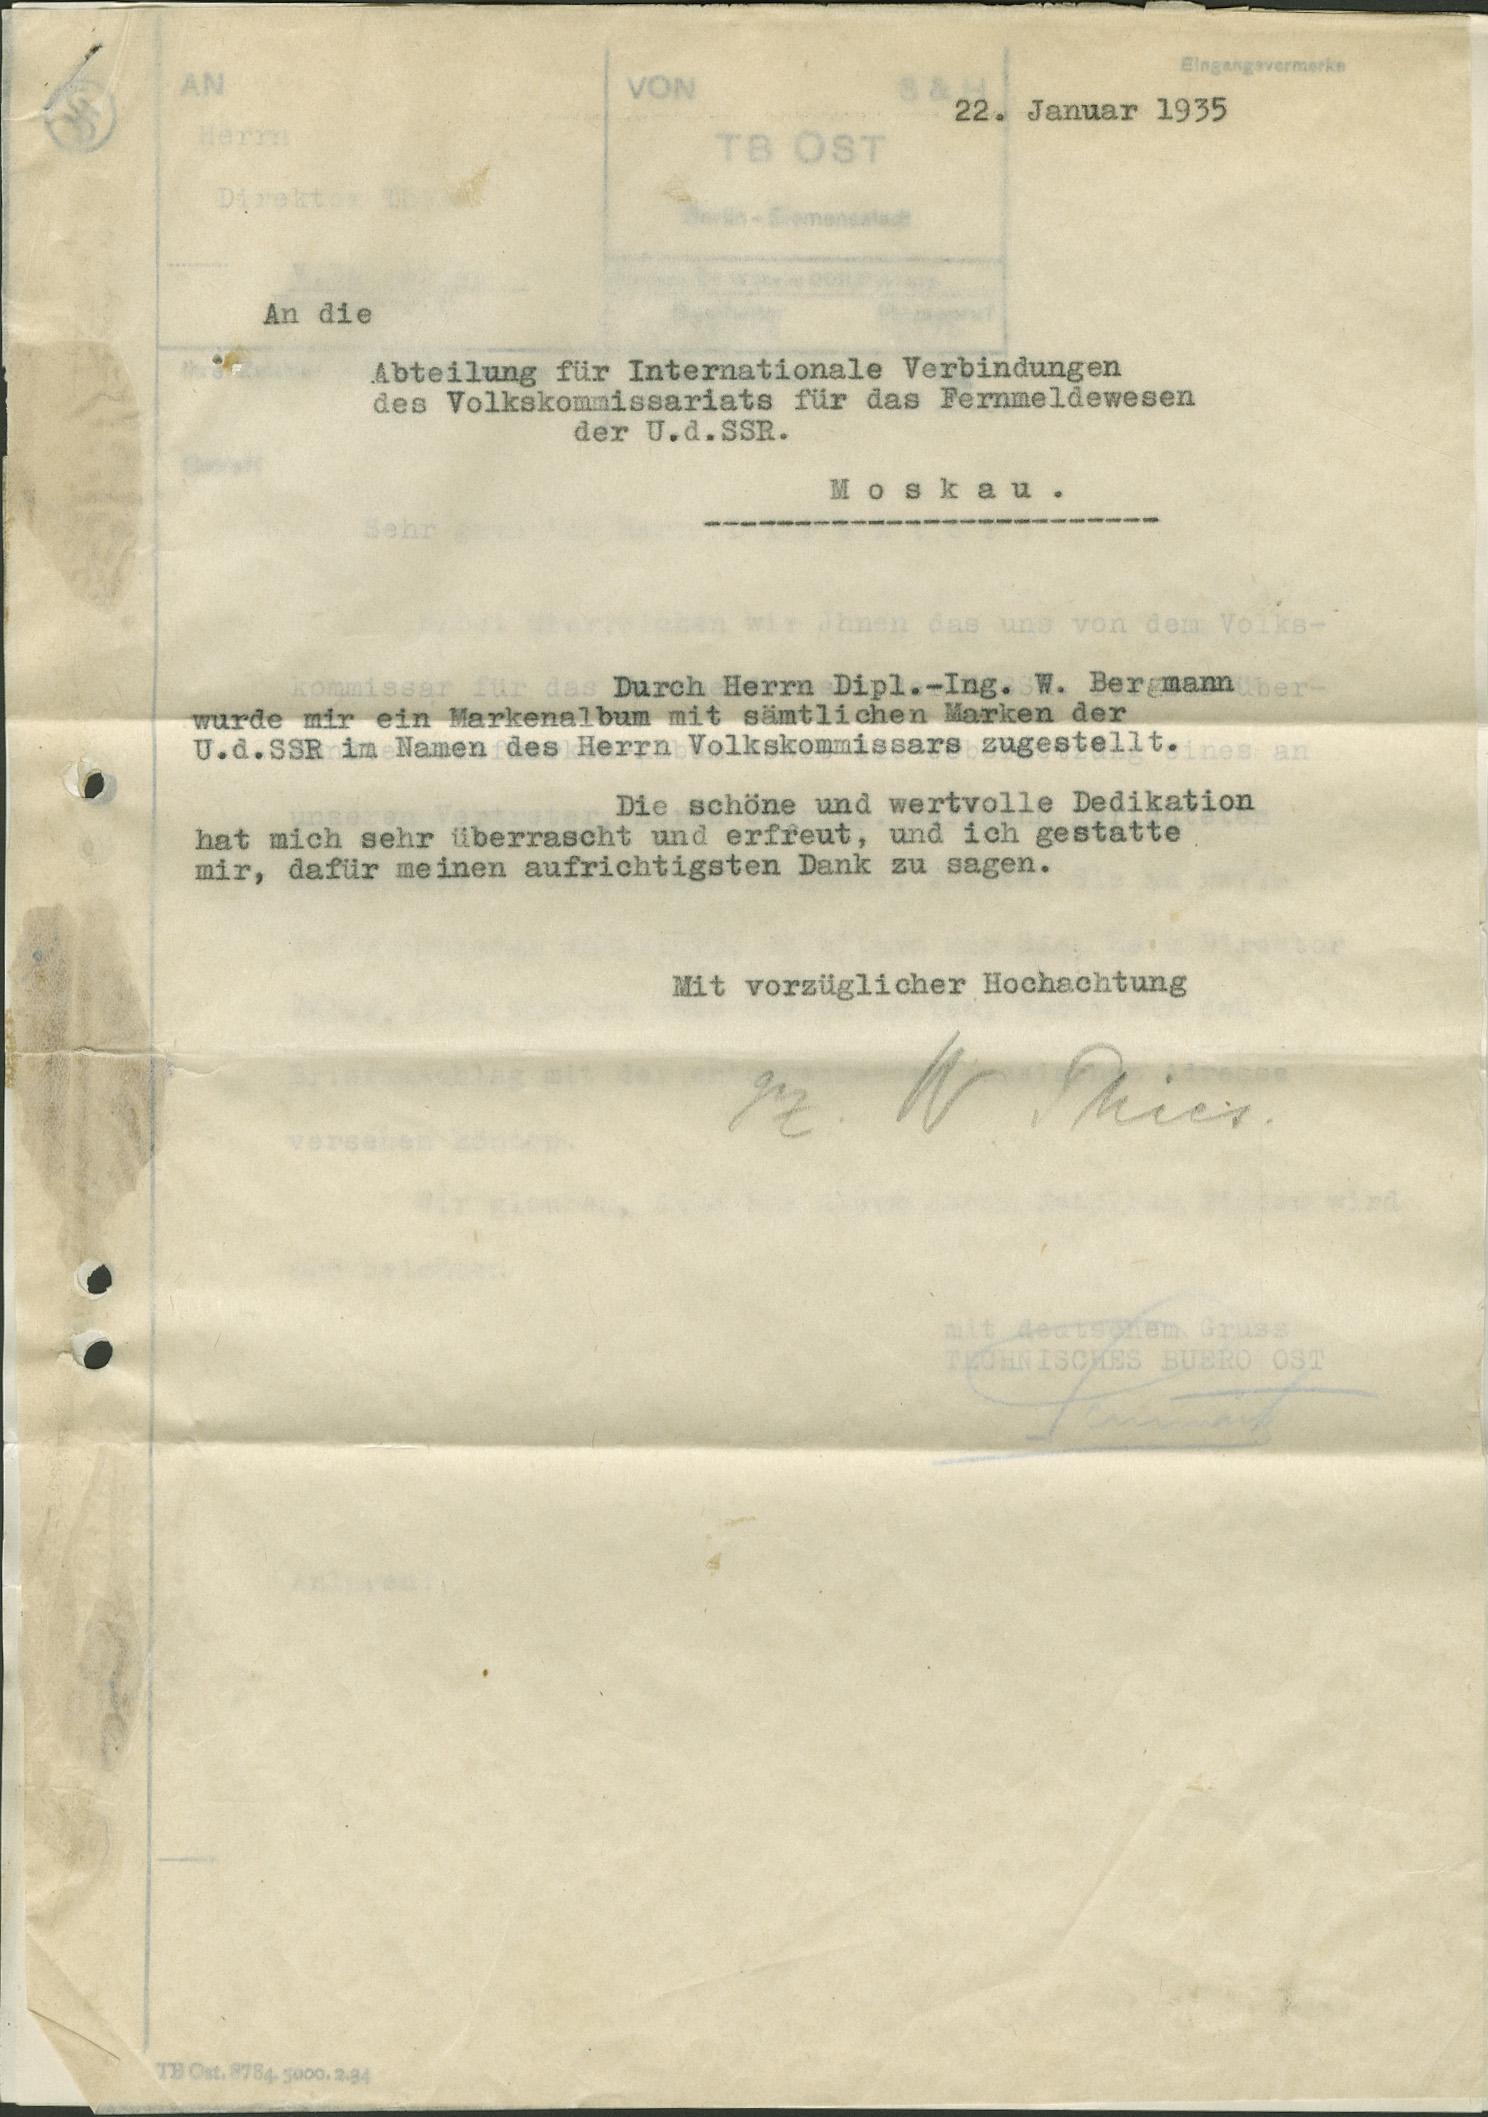 Lot 7699 - Europa A-Z Russland/Sowjetunion - Sowjetunion -  Auktionshaus Ulrich Felzmann GmbH & Co. KG